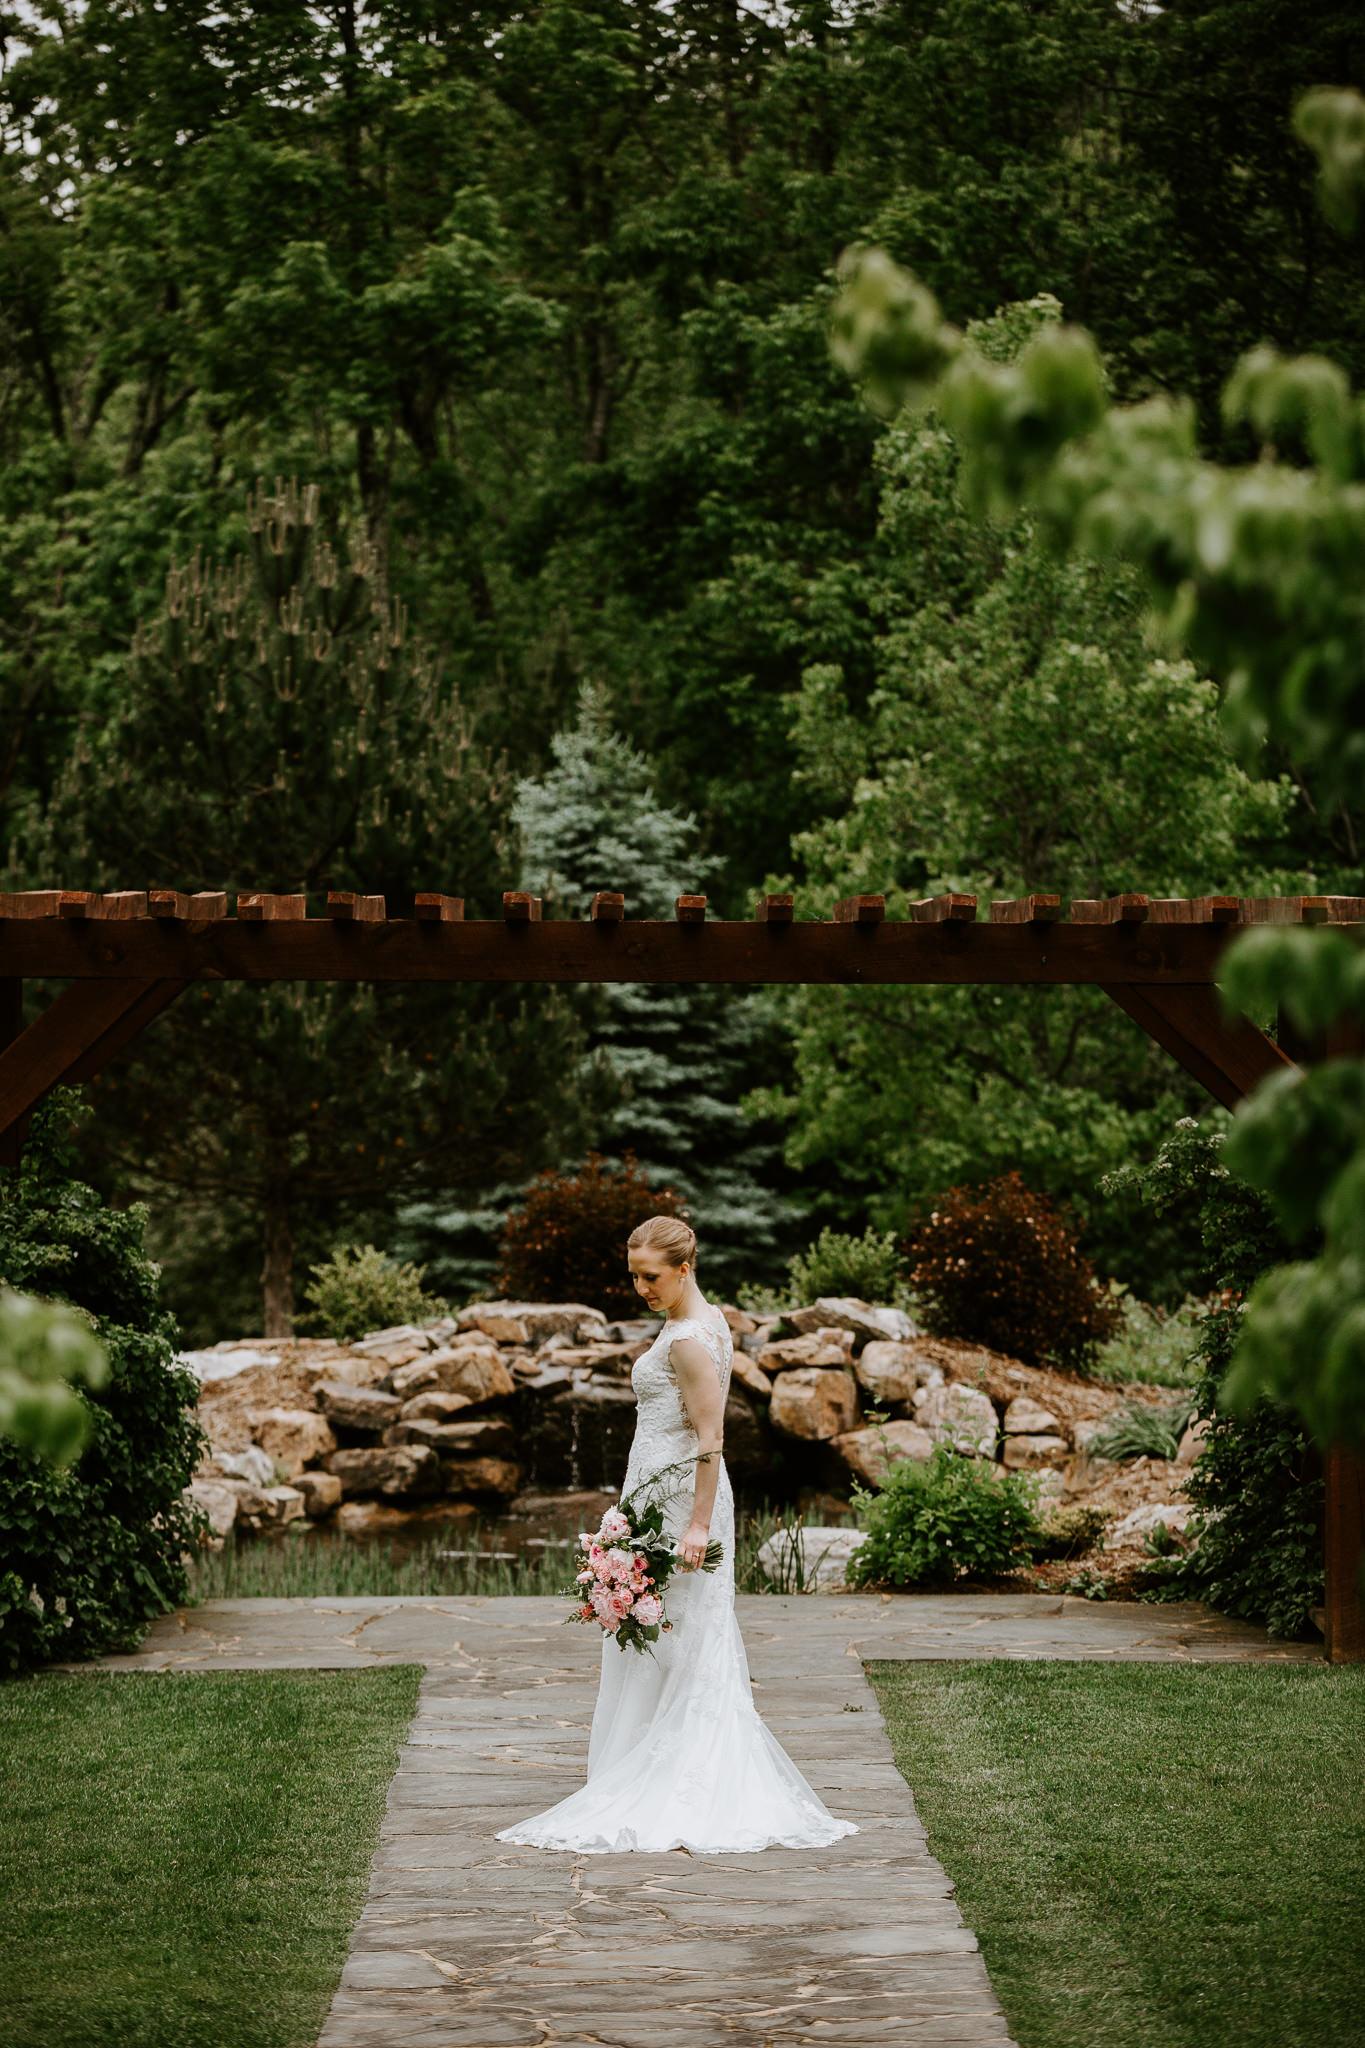 House Mountain Inn - Weddings - Lexington - Virginia - Best Wedding Photographer - Pat Cori Photography-44.jpg